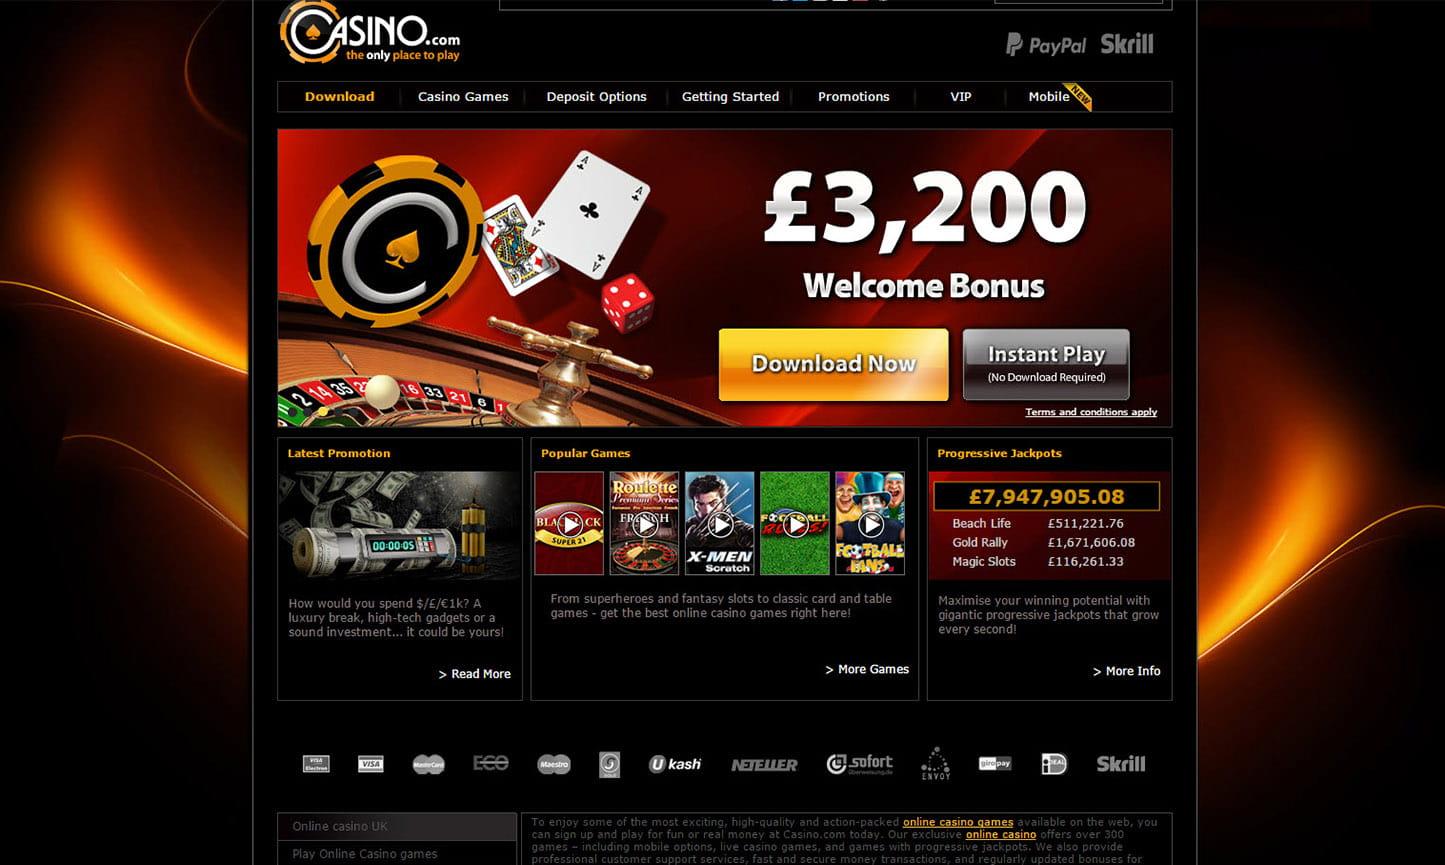 Play Azteca Online Slots at Casino.com UK